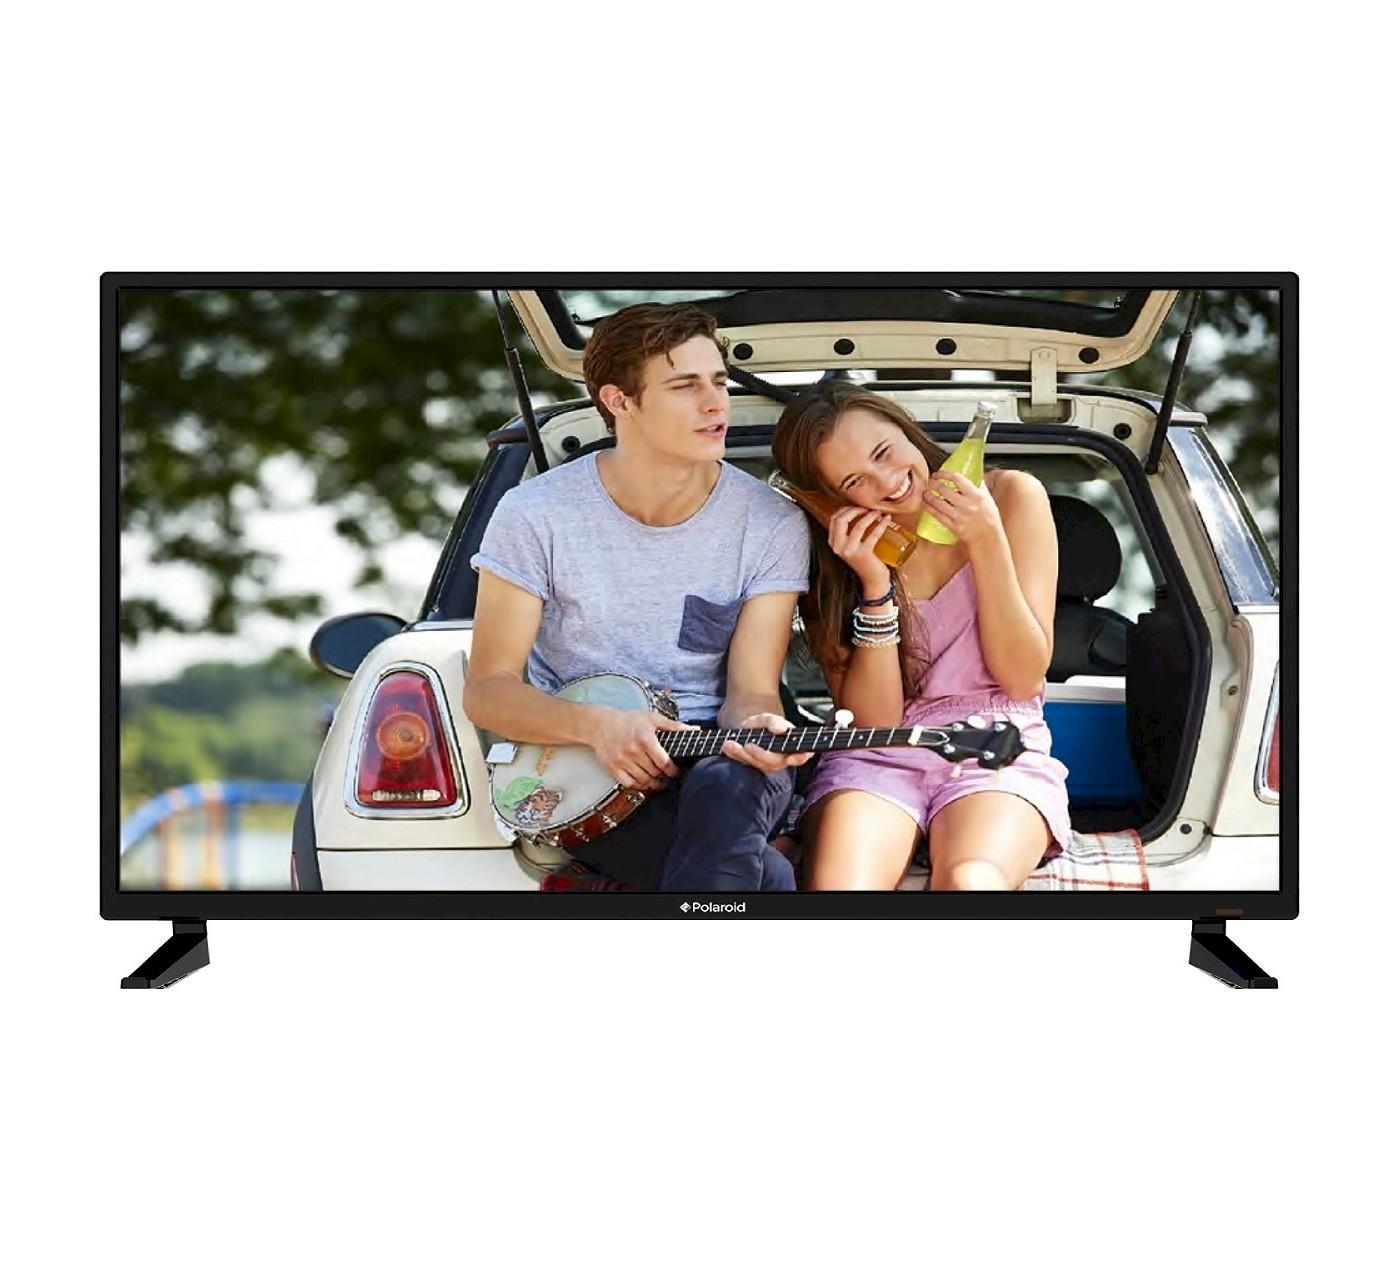 "Polaroid 32GSR3000FC 32"" Flat Panel 720p LED TV - image 1 of 4"